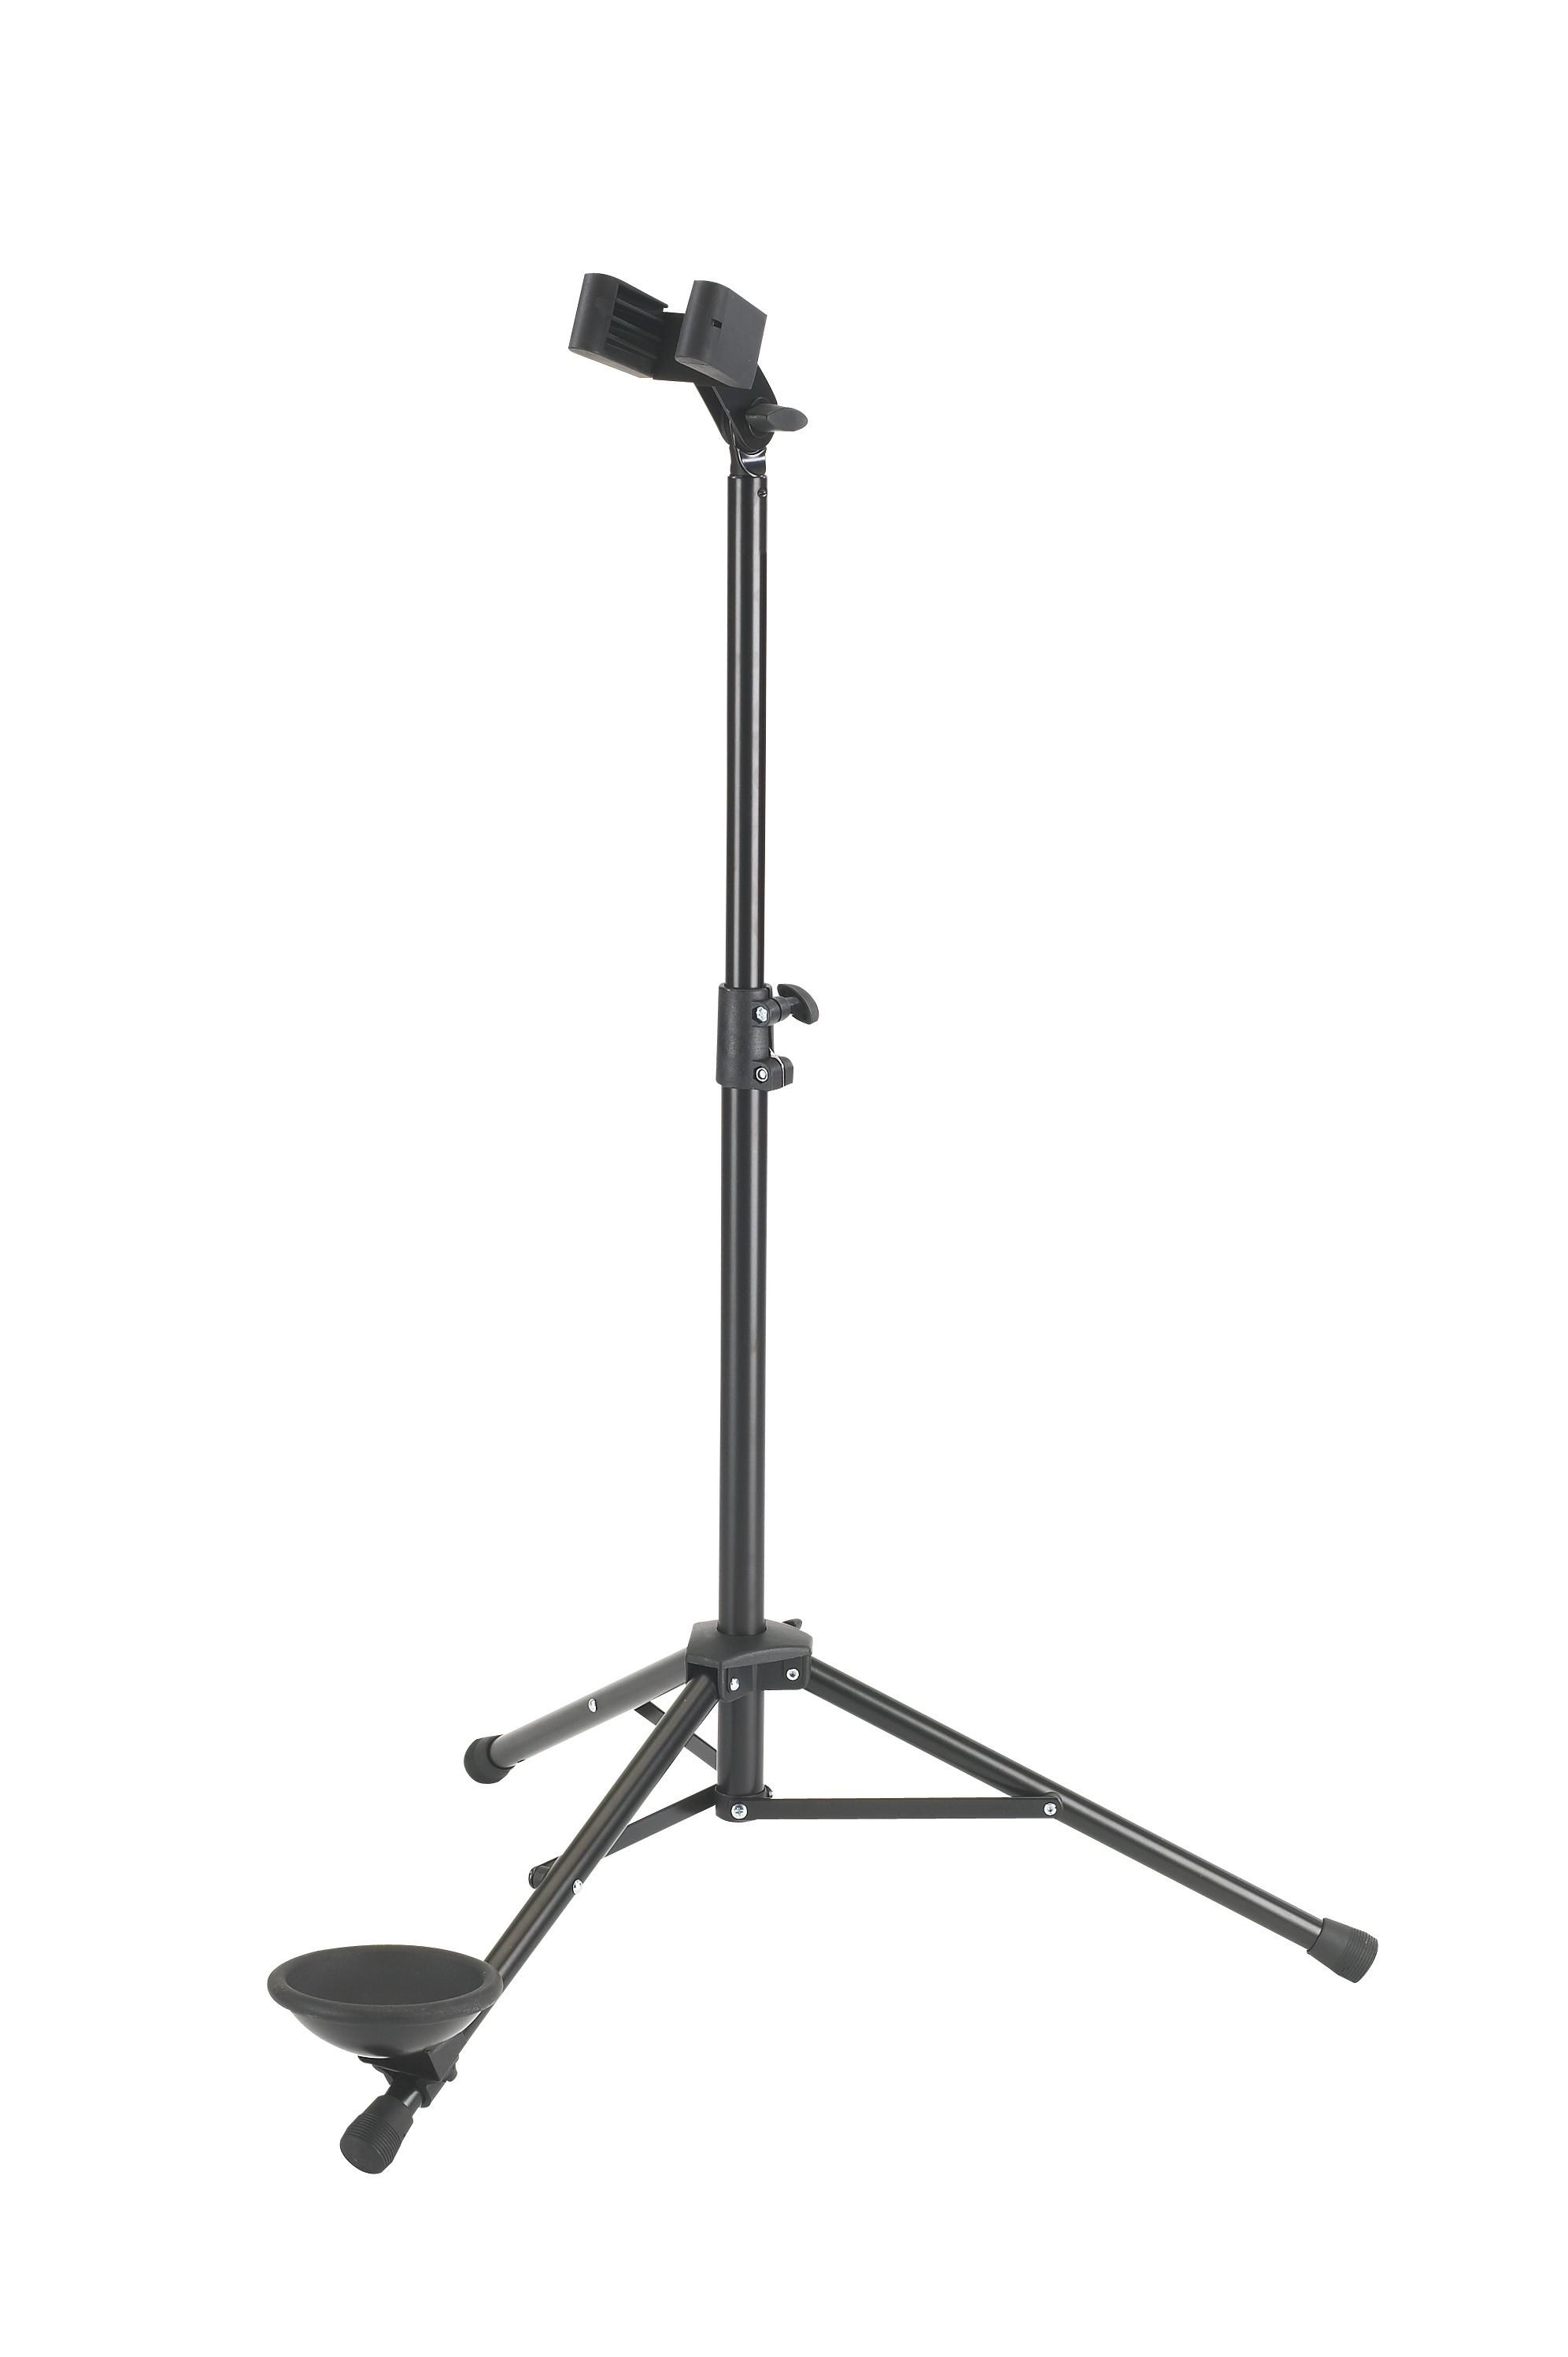 Konig & Meyer 150/1 Bassoon Stand